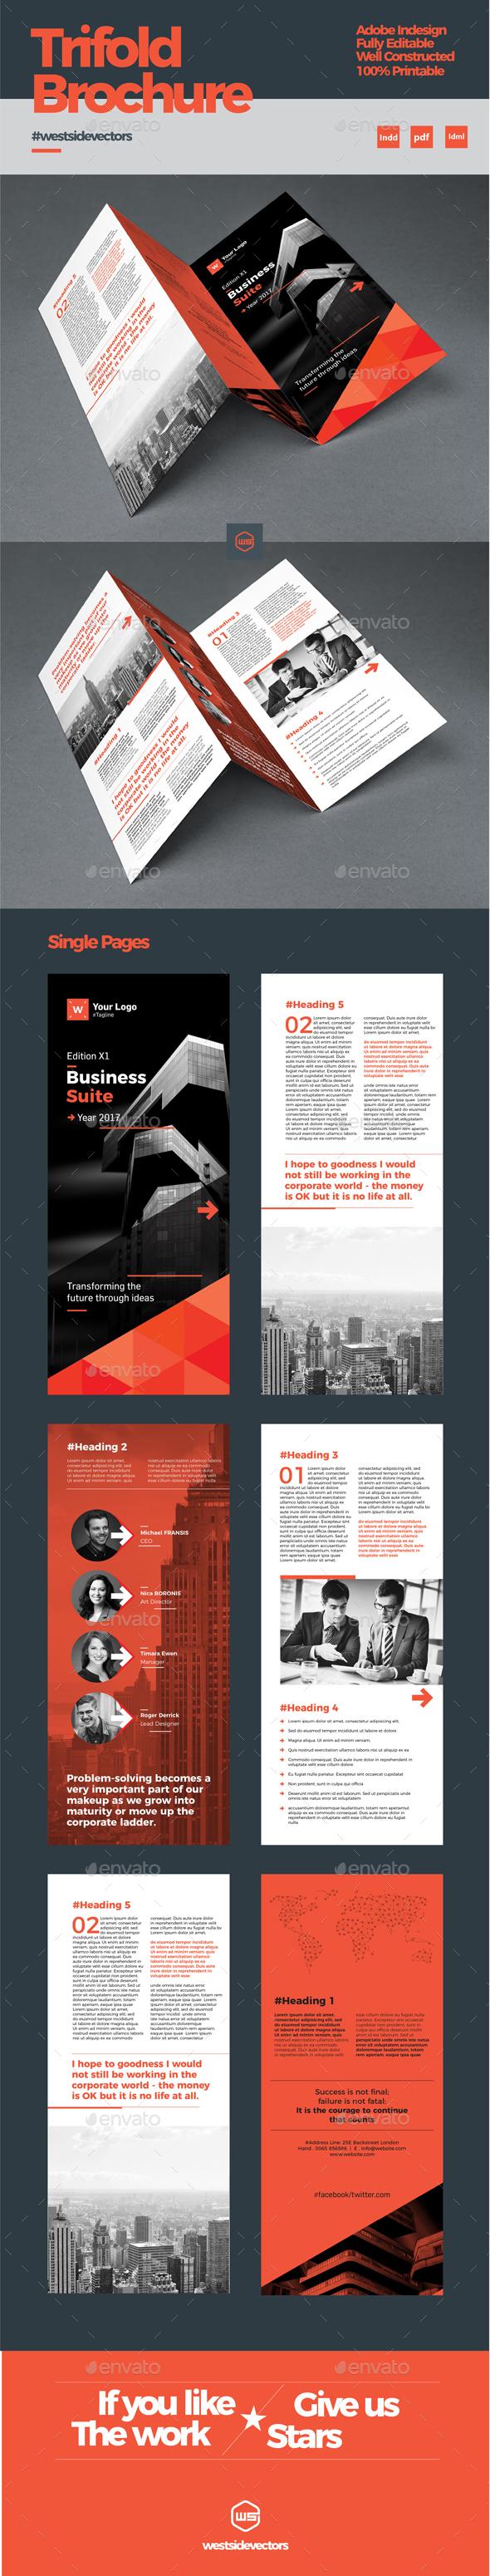 Trifold Brochure - Print Templates